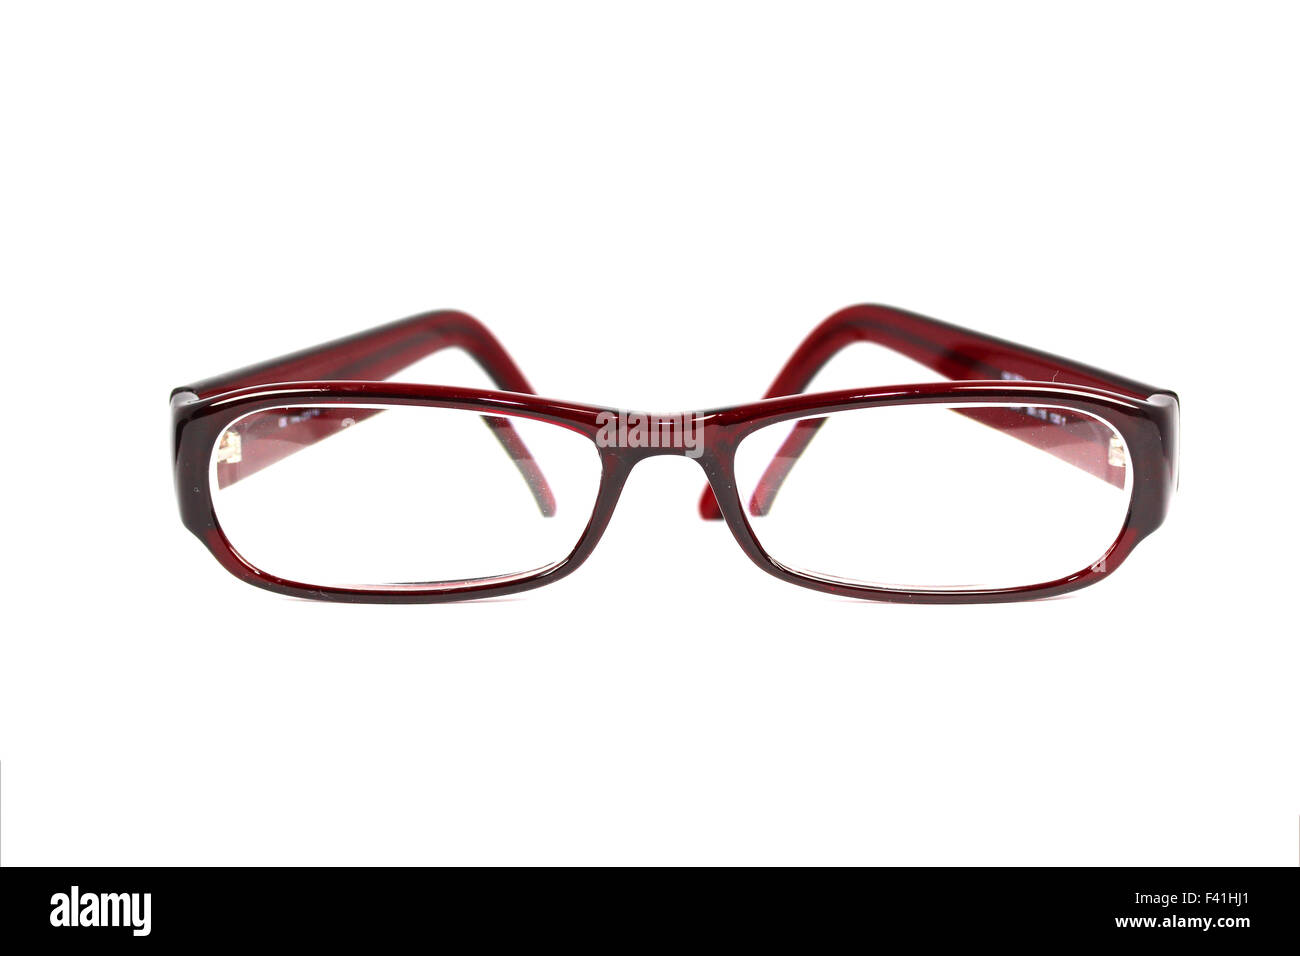 eyeglasses Stock Photo